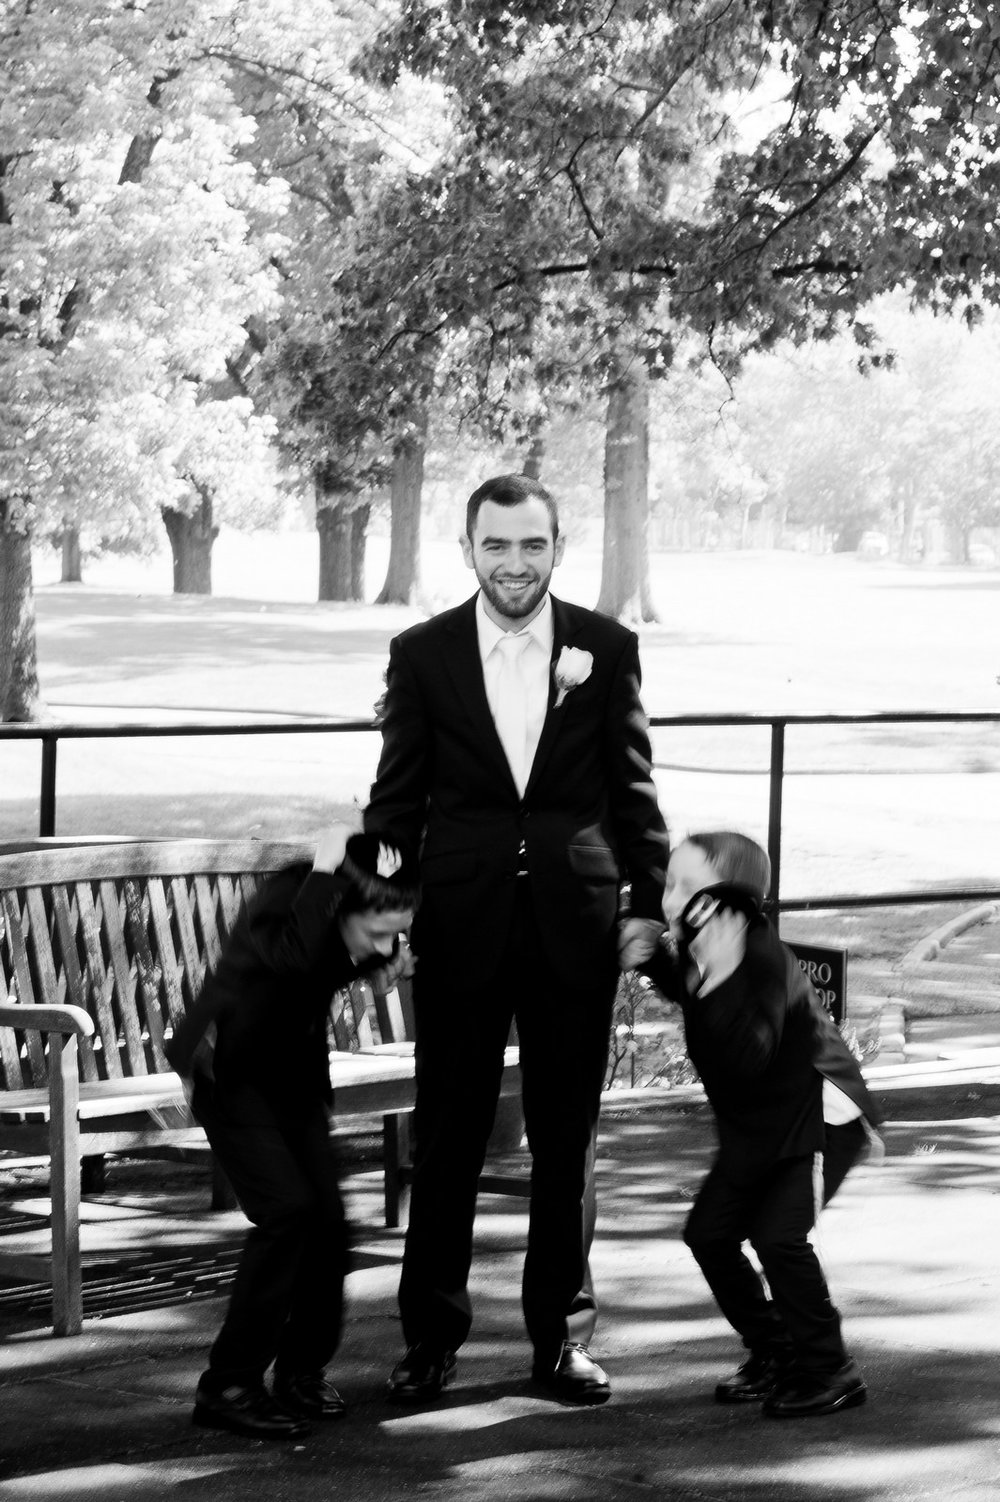 Orthodox Jewish Wedding, Dyker Beach Park and Golf Course, Brooklyn, New York, Photo by Chaim Schvarcz, Groom Portraits, Nephews, Family